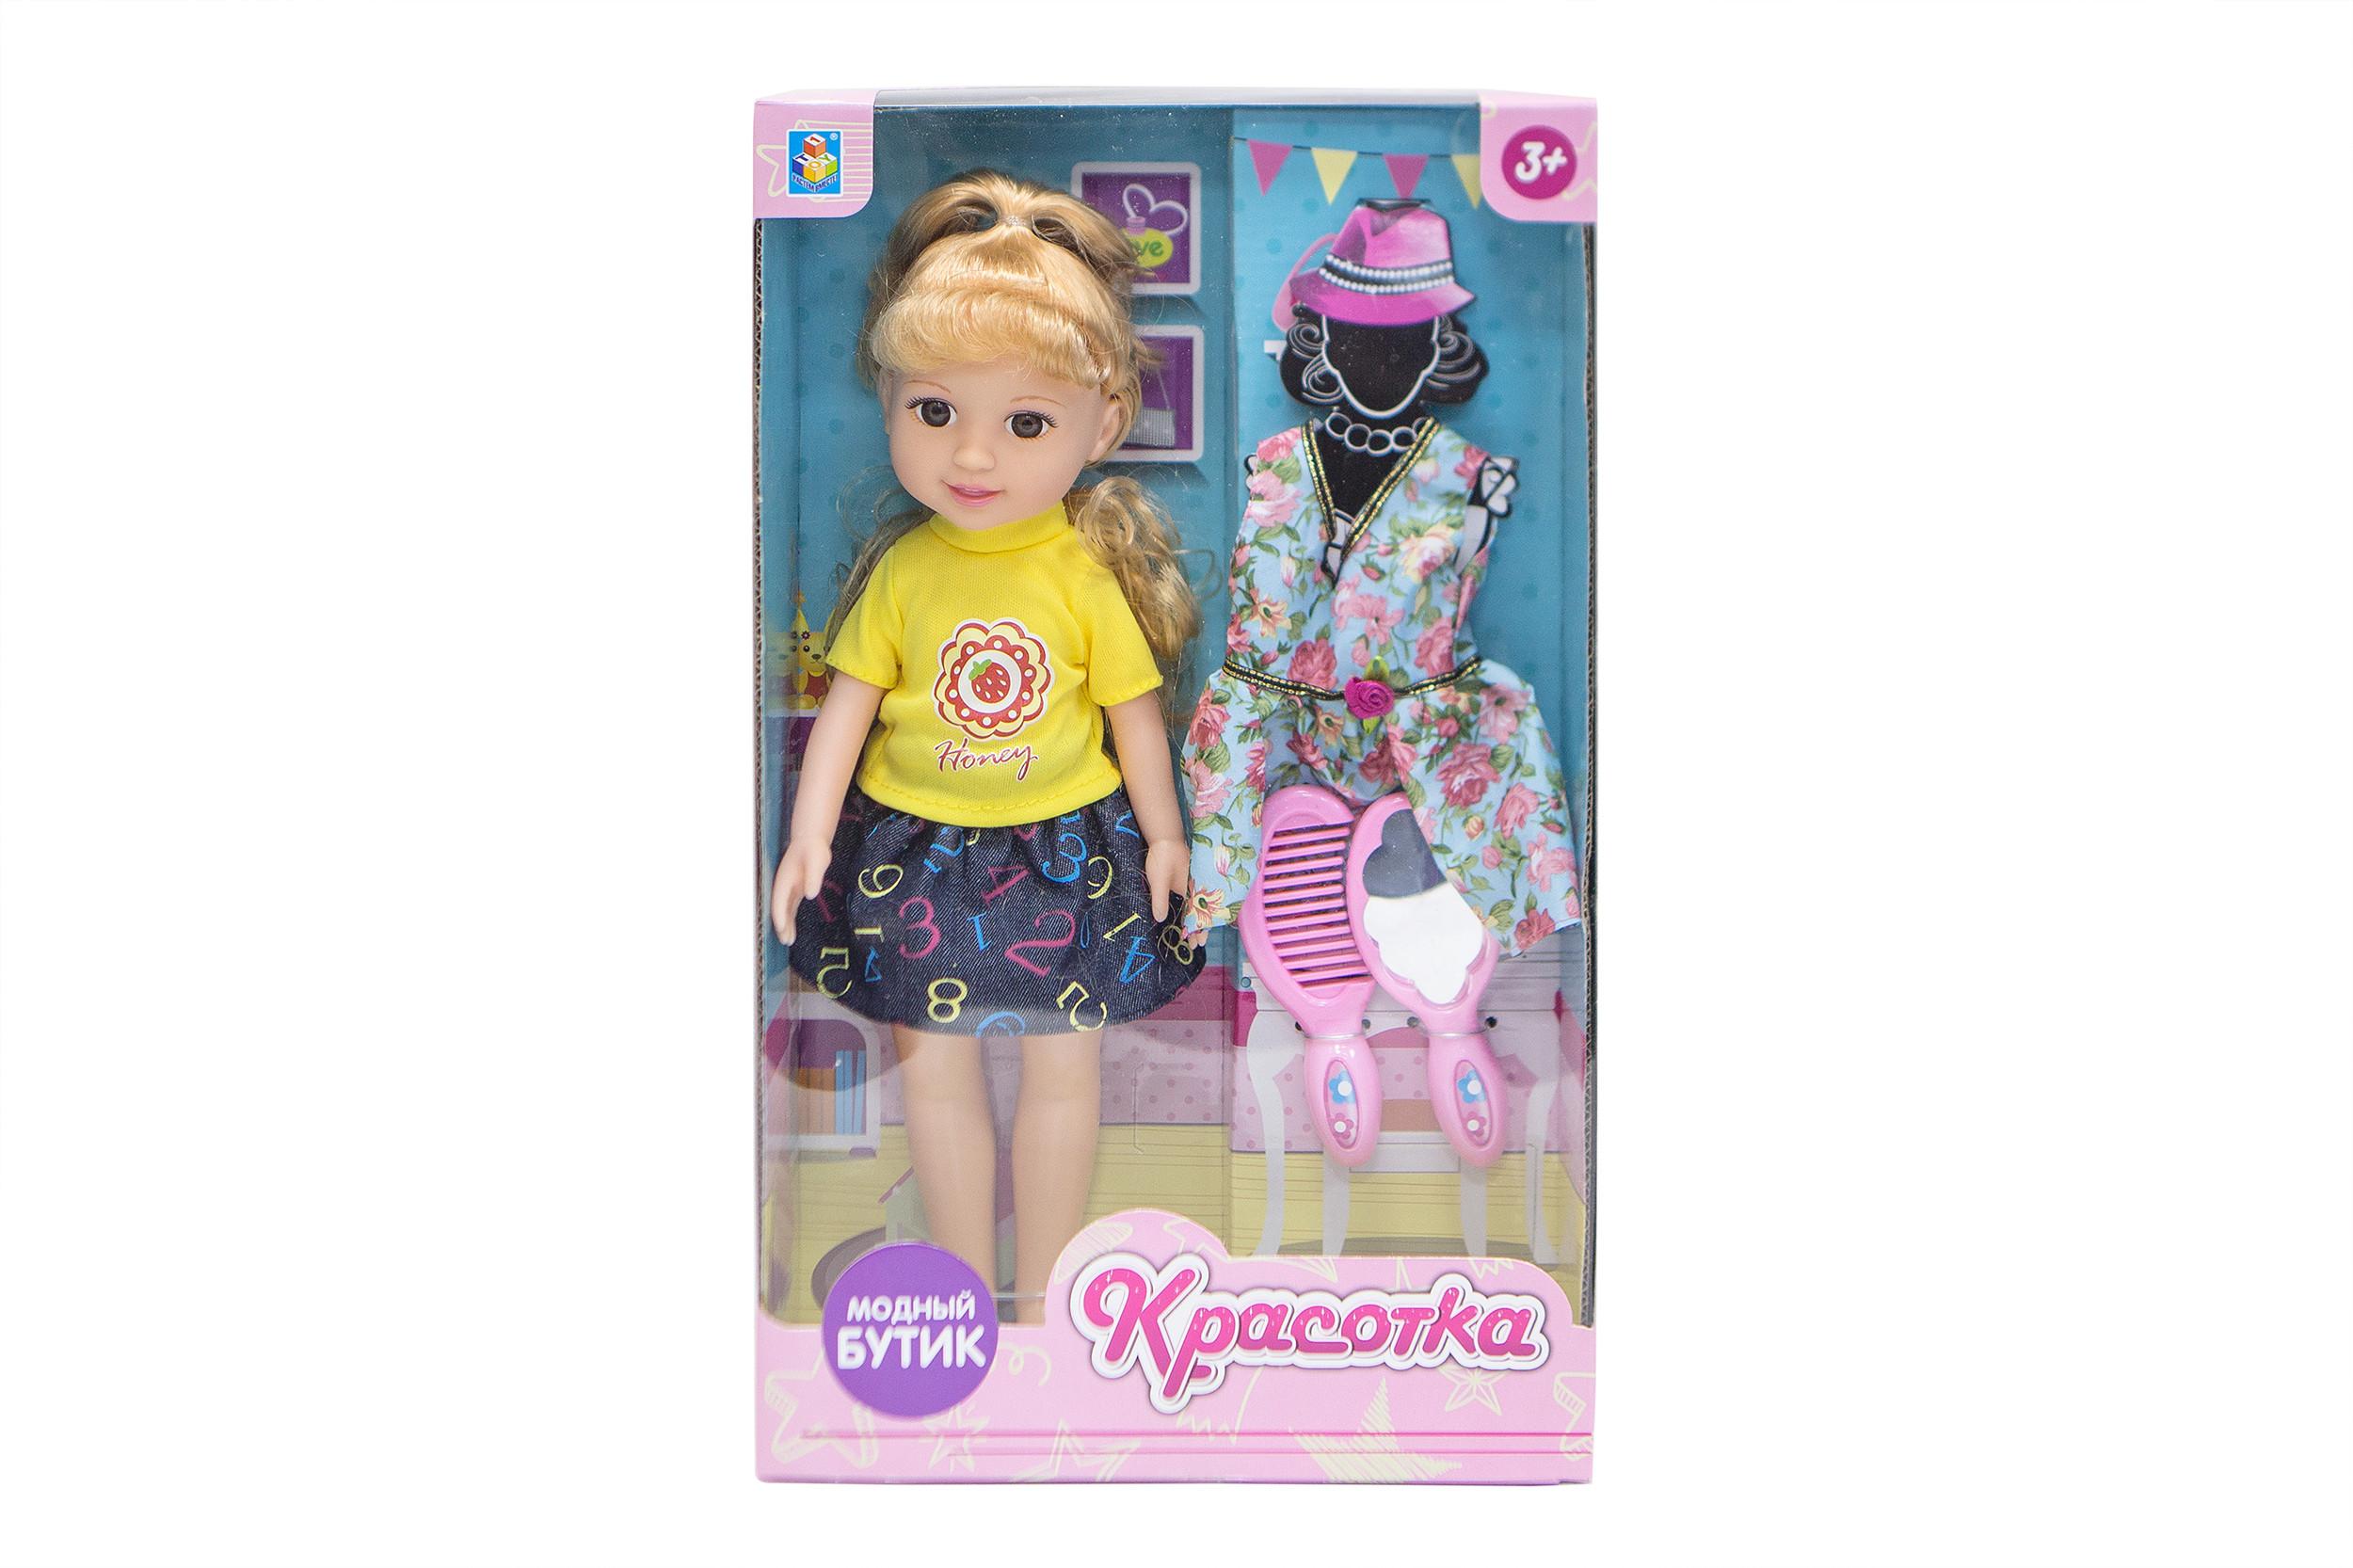 Классические куклы 1toy Кукла 1Toy «Красотка. Модный Бутик» блондинка с аксесс. 1toy красотка белый